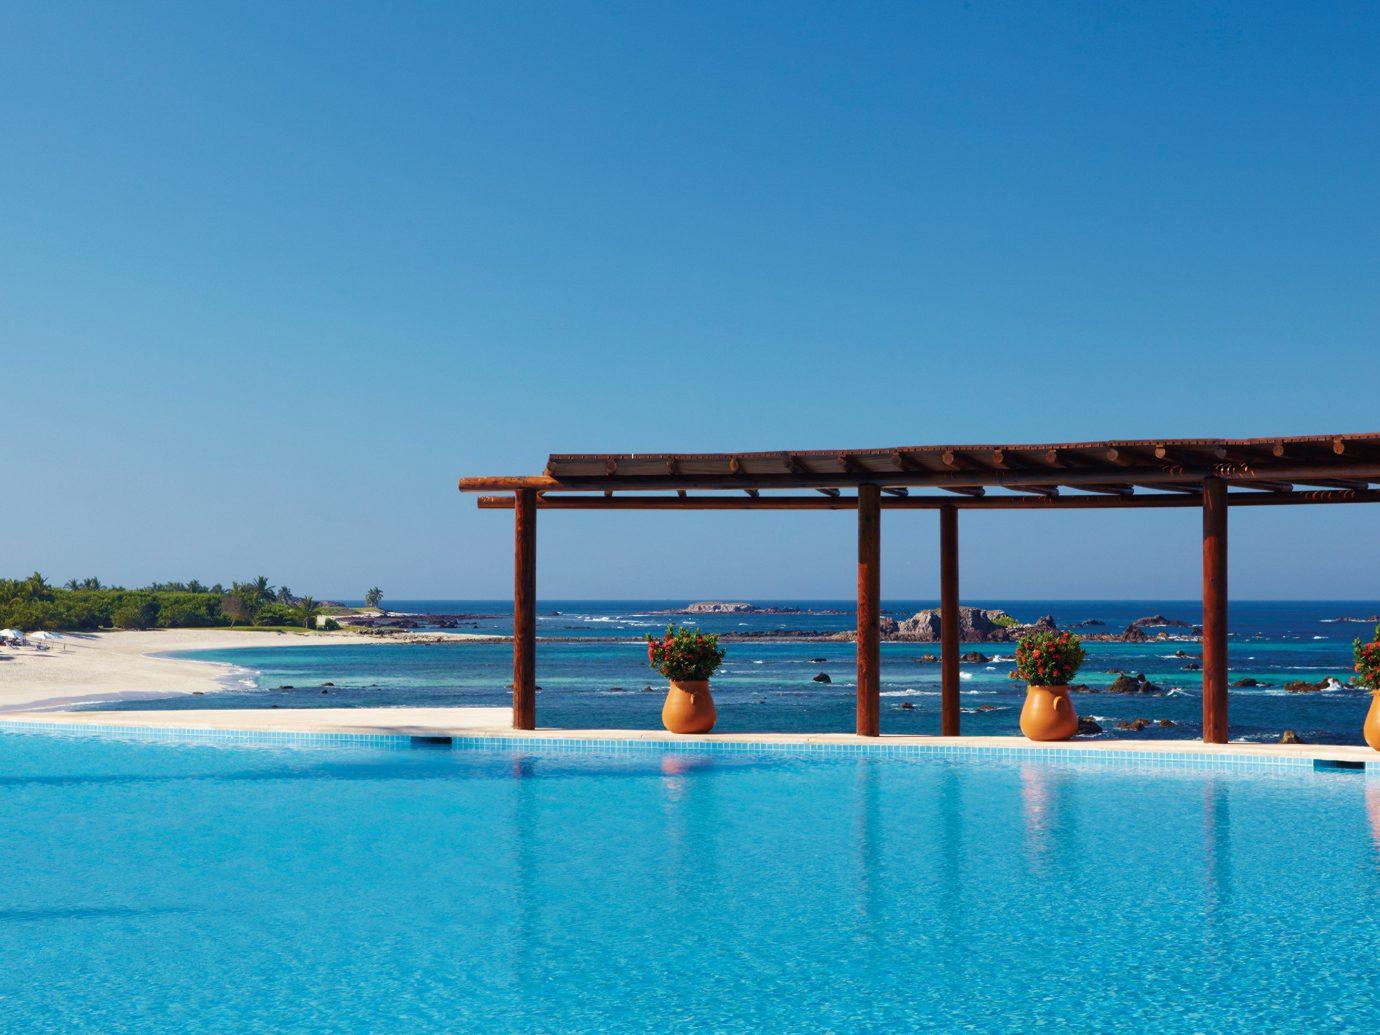 Pool at Four Seasons Resort Punta Mita, Mexico